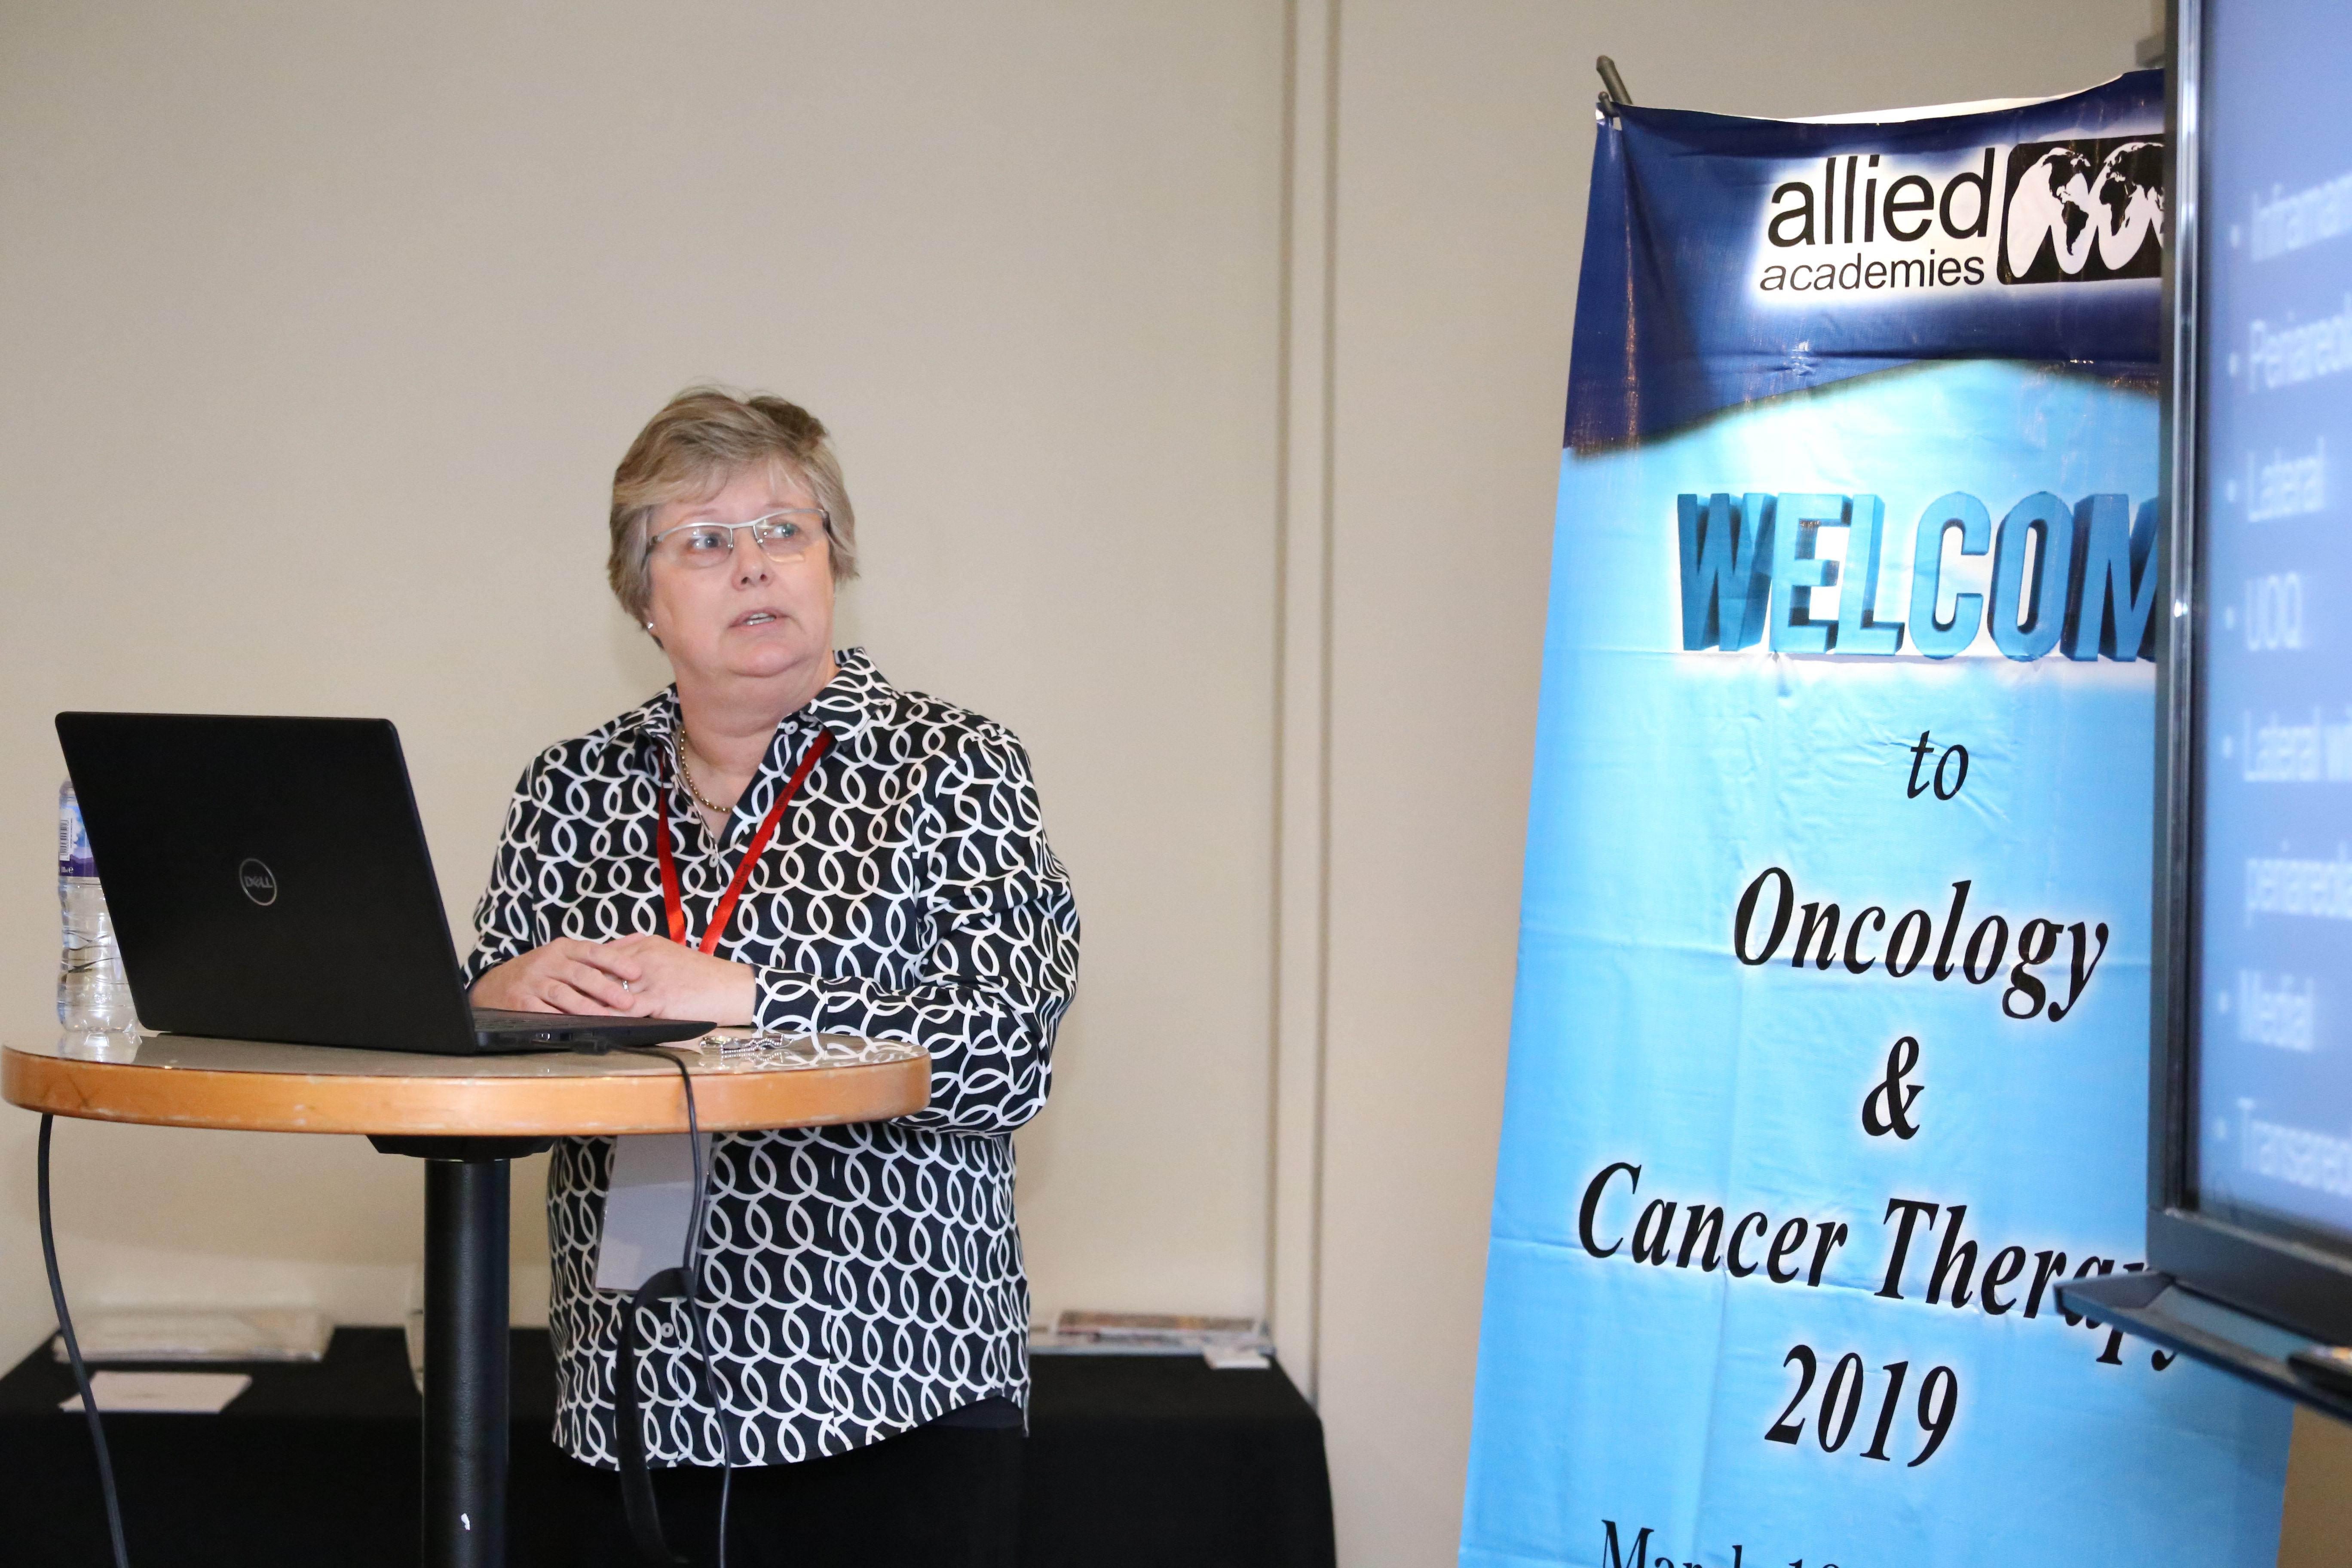 Cancer Therapy 2019 Photos